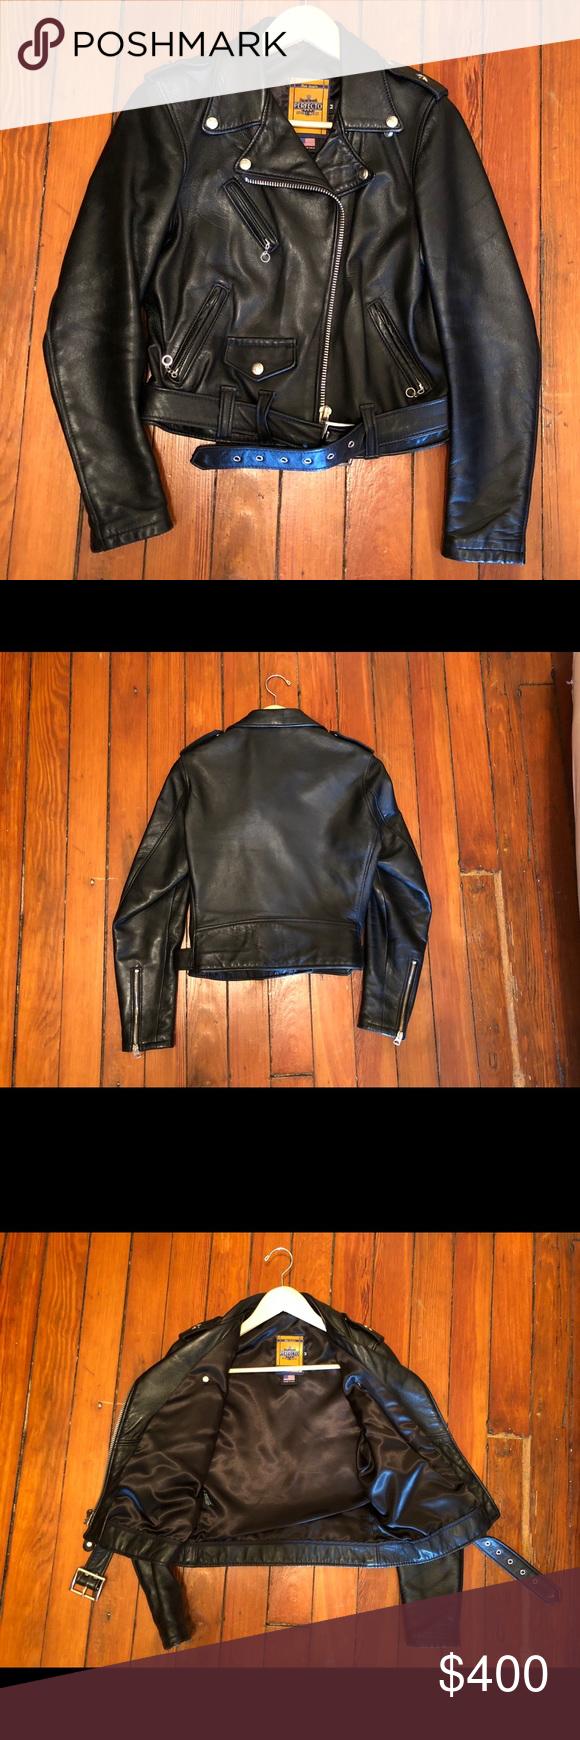 Women S Schott Perfecto Leather Jacket Leather Jacket Leather Jackets Women Jackets [ 1740 x 580 Pixel ]